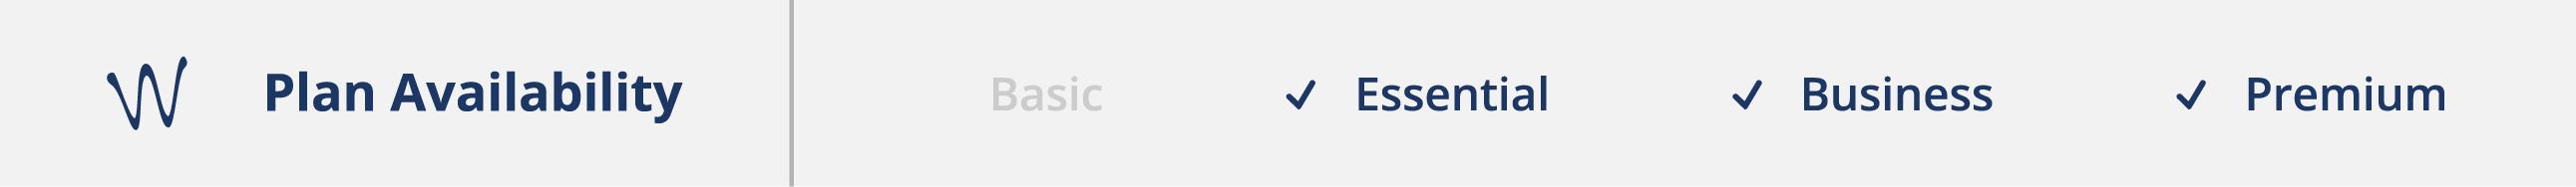 Plan Availability: Essential + Business + Premium